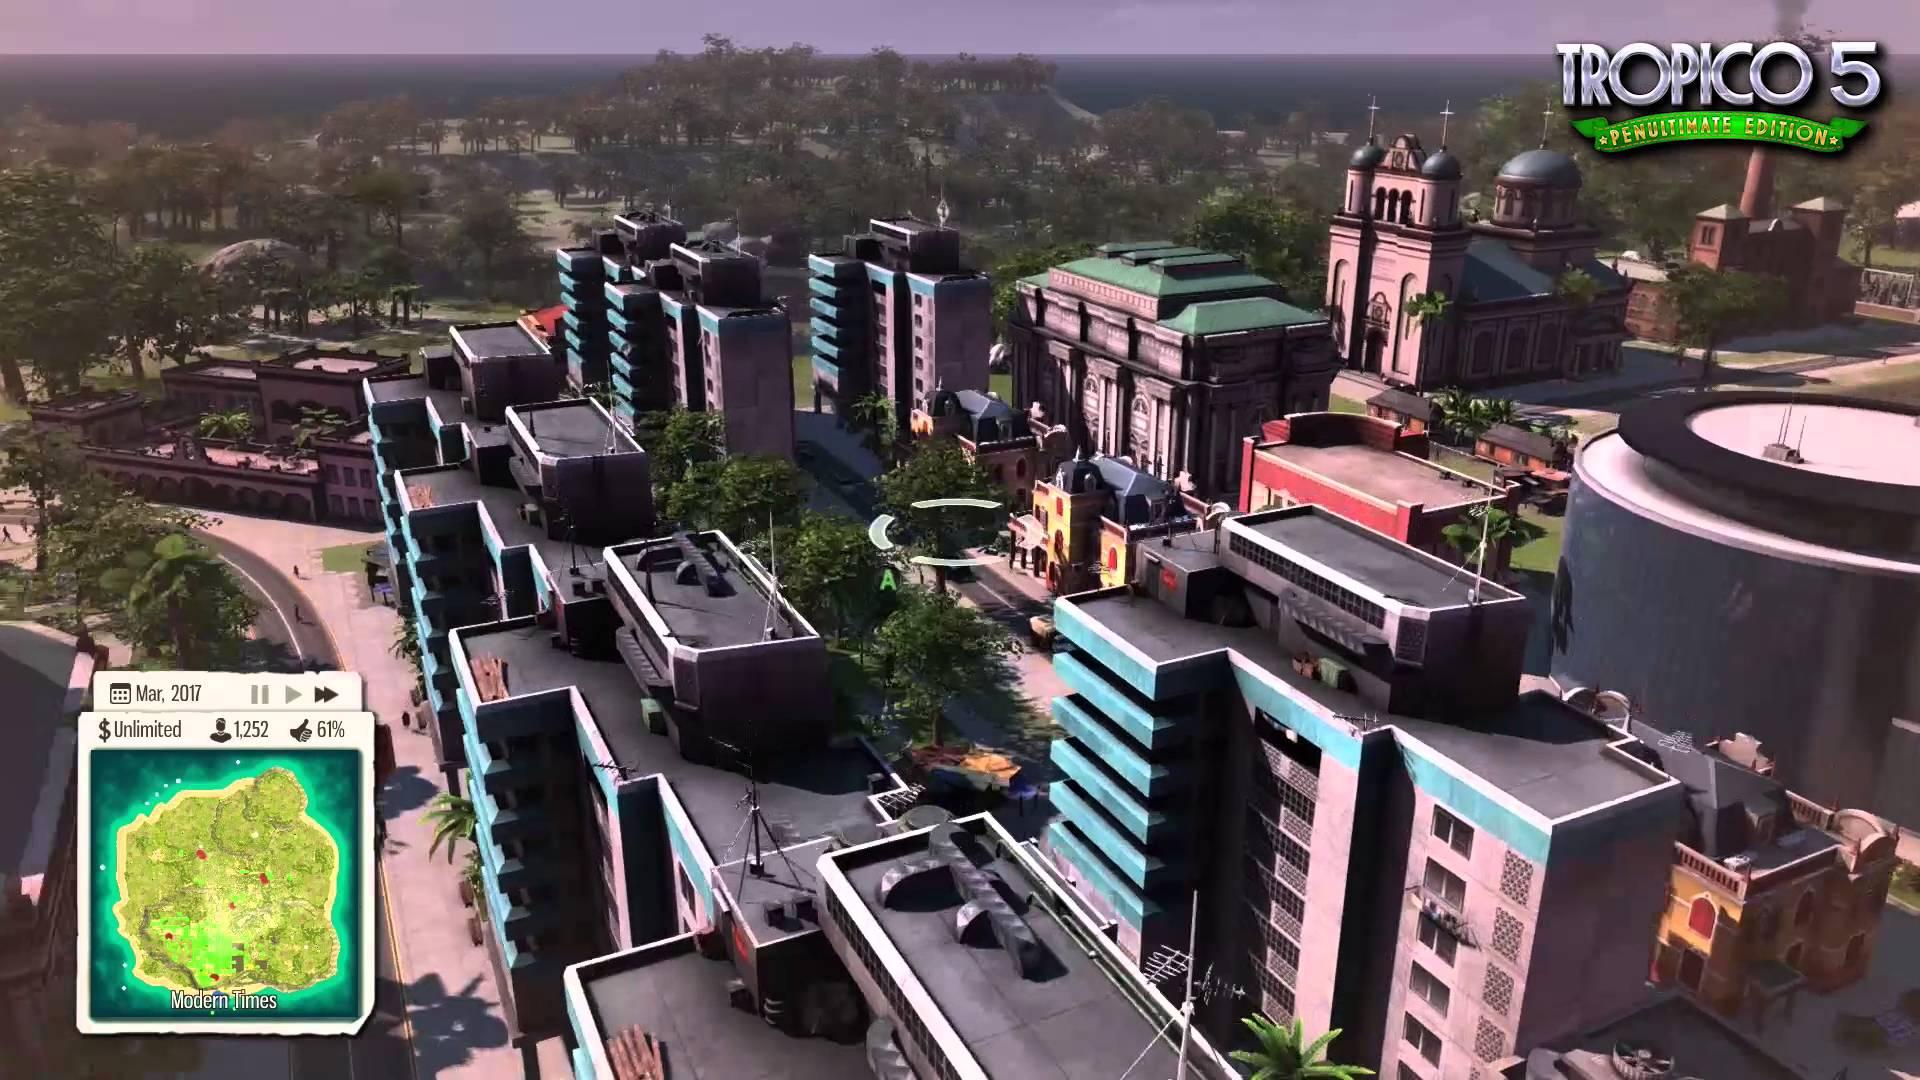 Tropico 5 Penultimate Edition (Xbox One) - Short Trailer